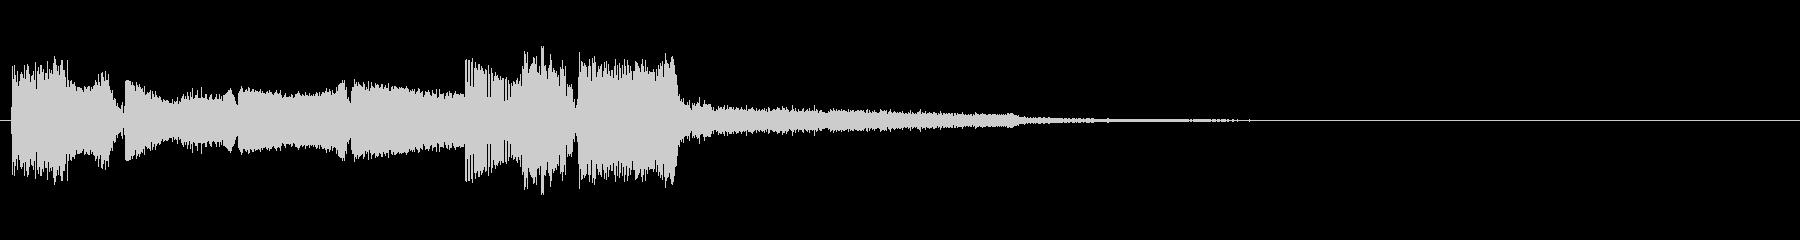 KANT近未来アラーム011042の未再生の波形